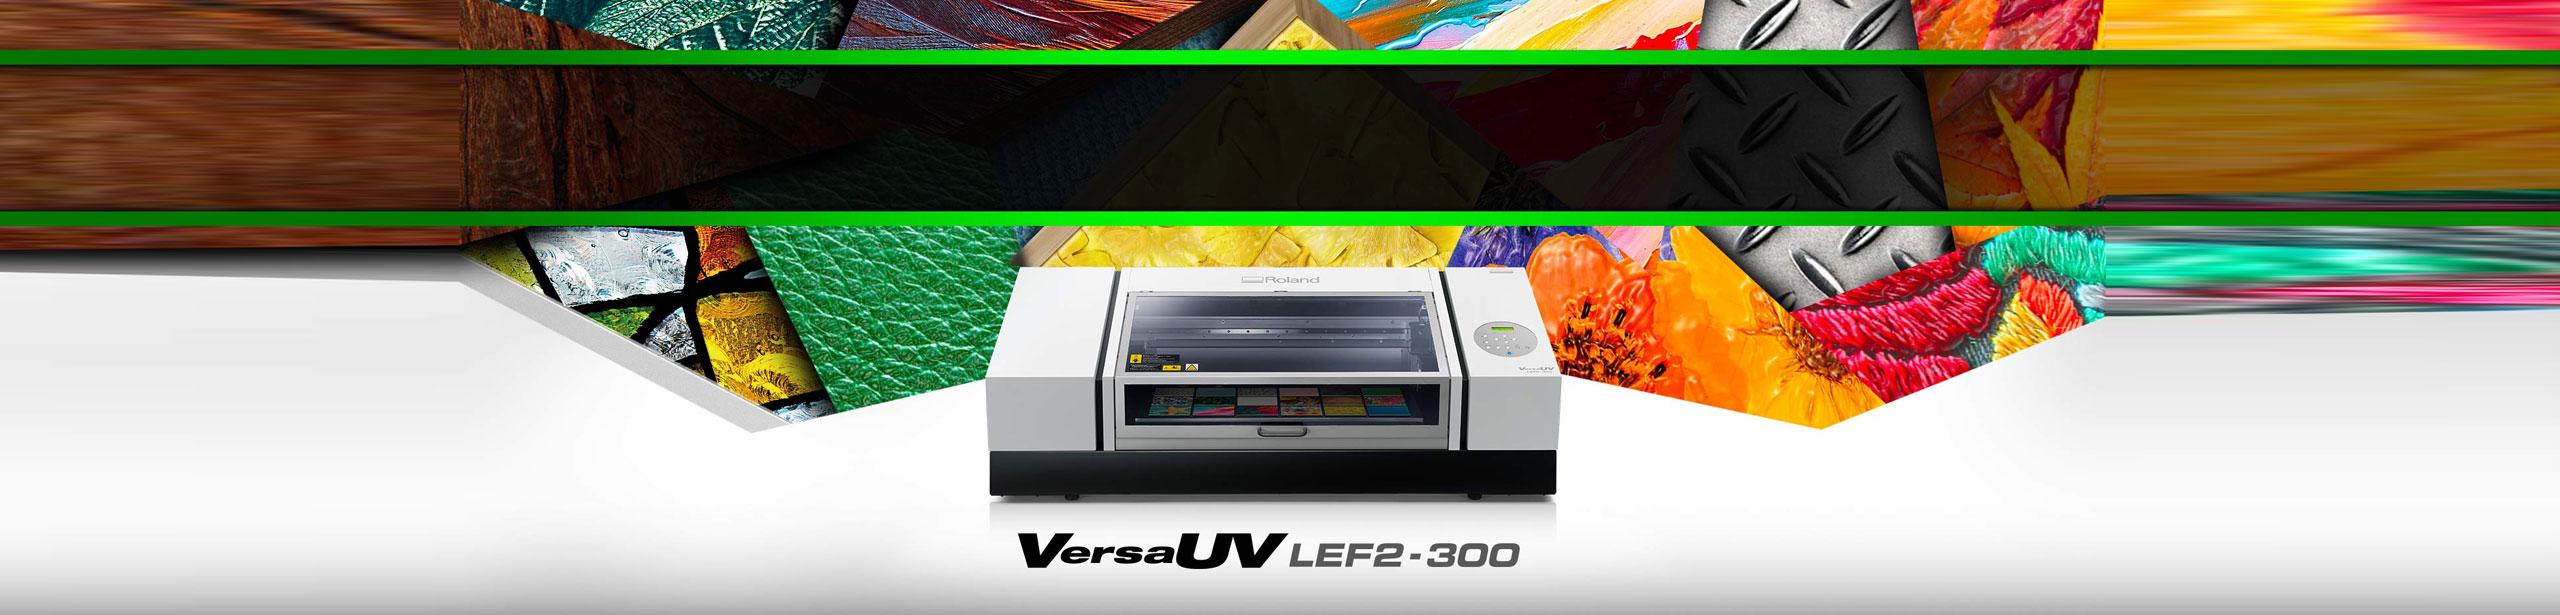 Roland VersaUV LEF2-300